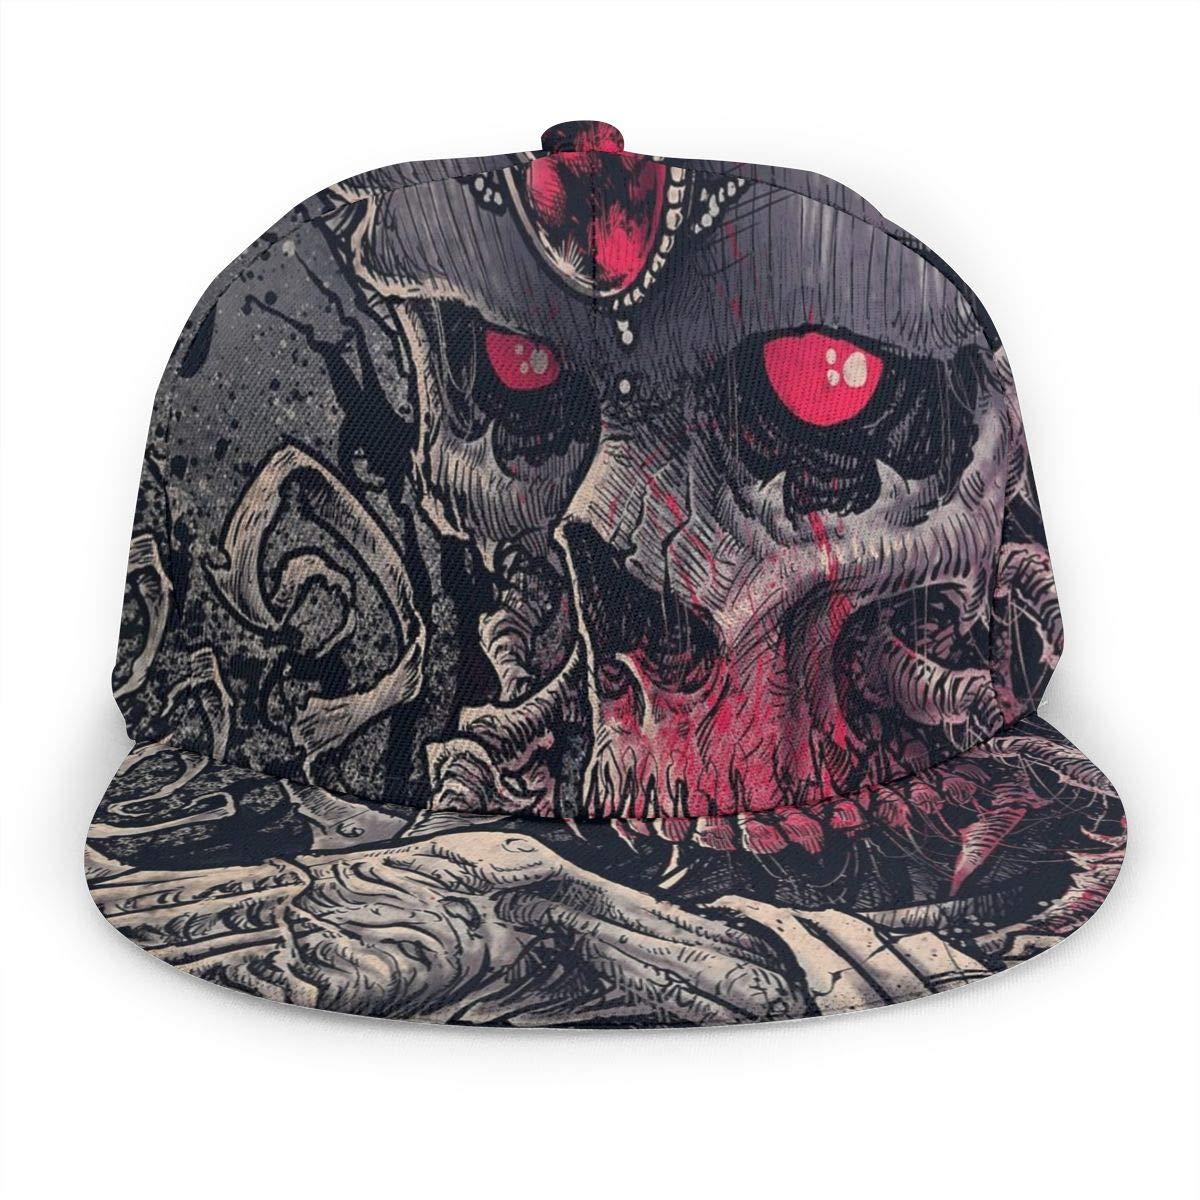 Cool Dark Skull Denim Dad Cap Baseball Hat Adjustable Sun Cap Hip Pop Hat